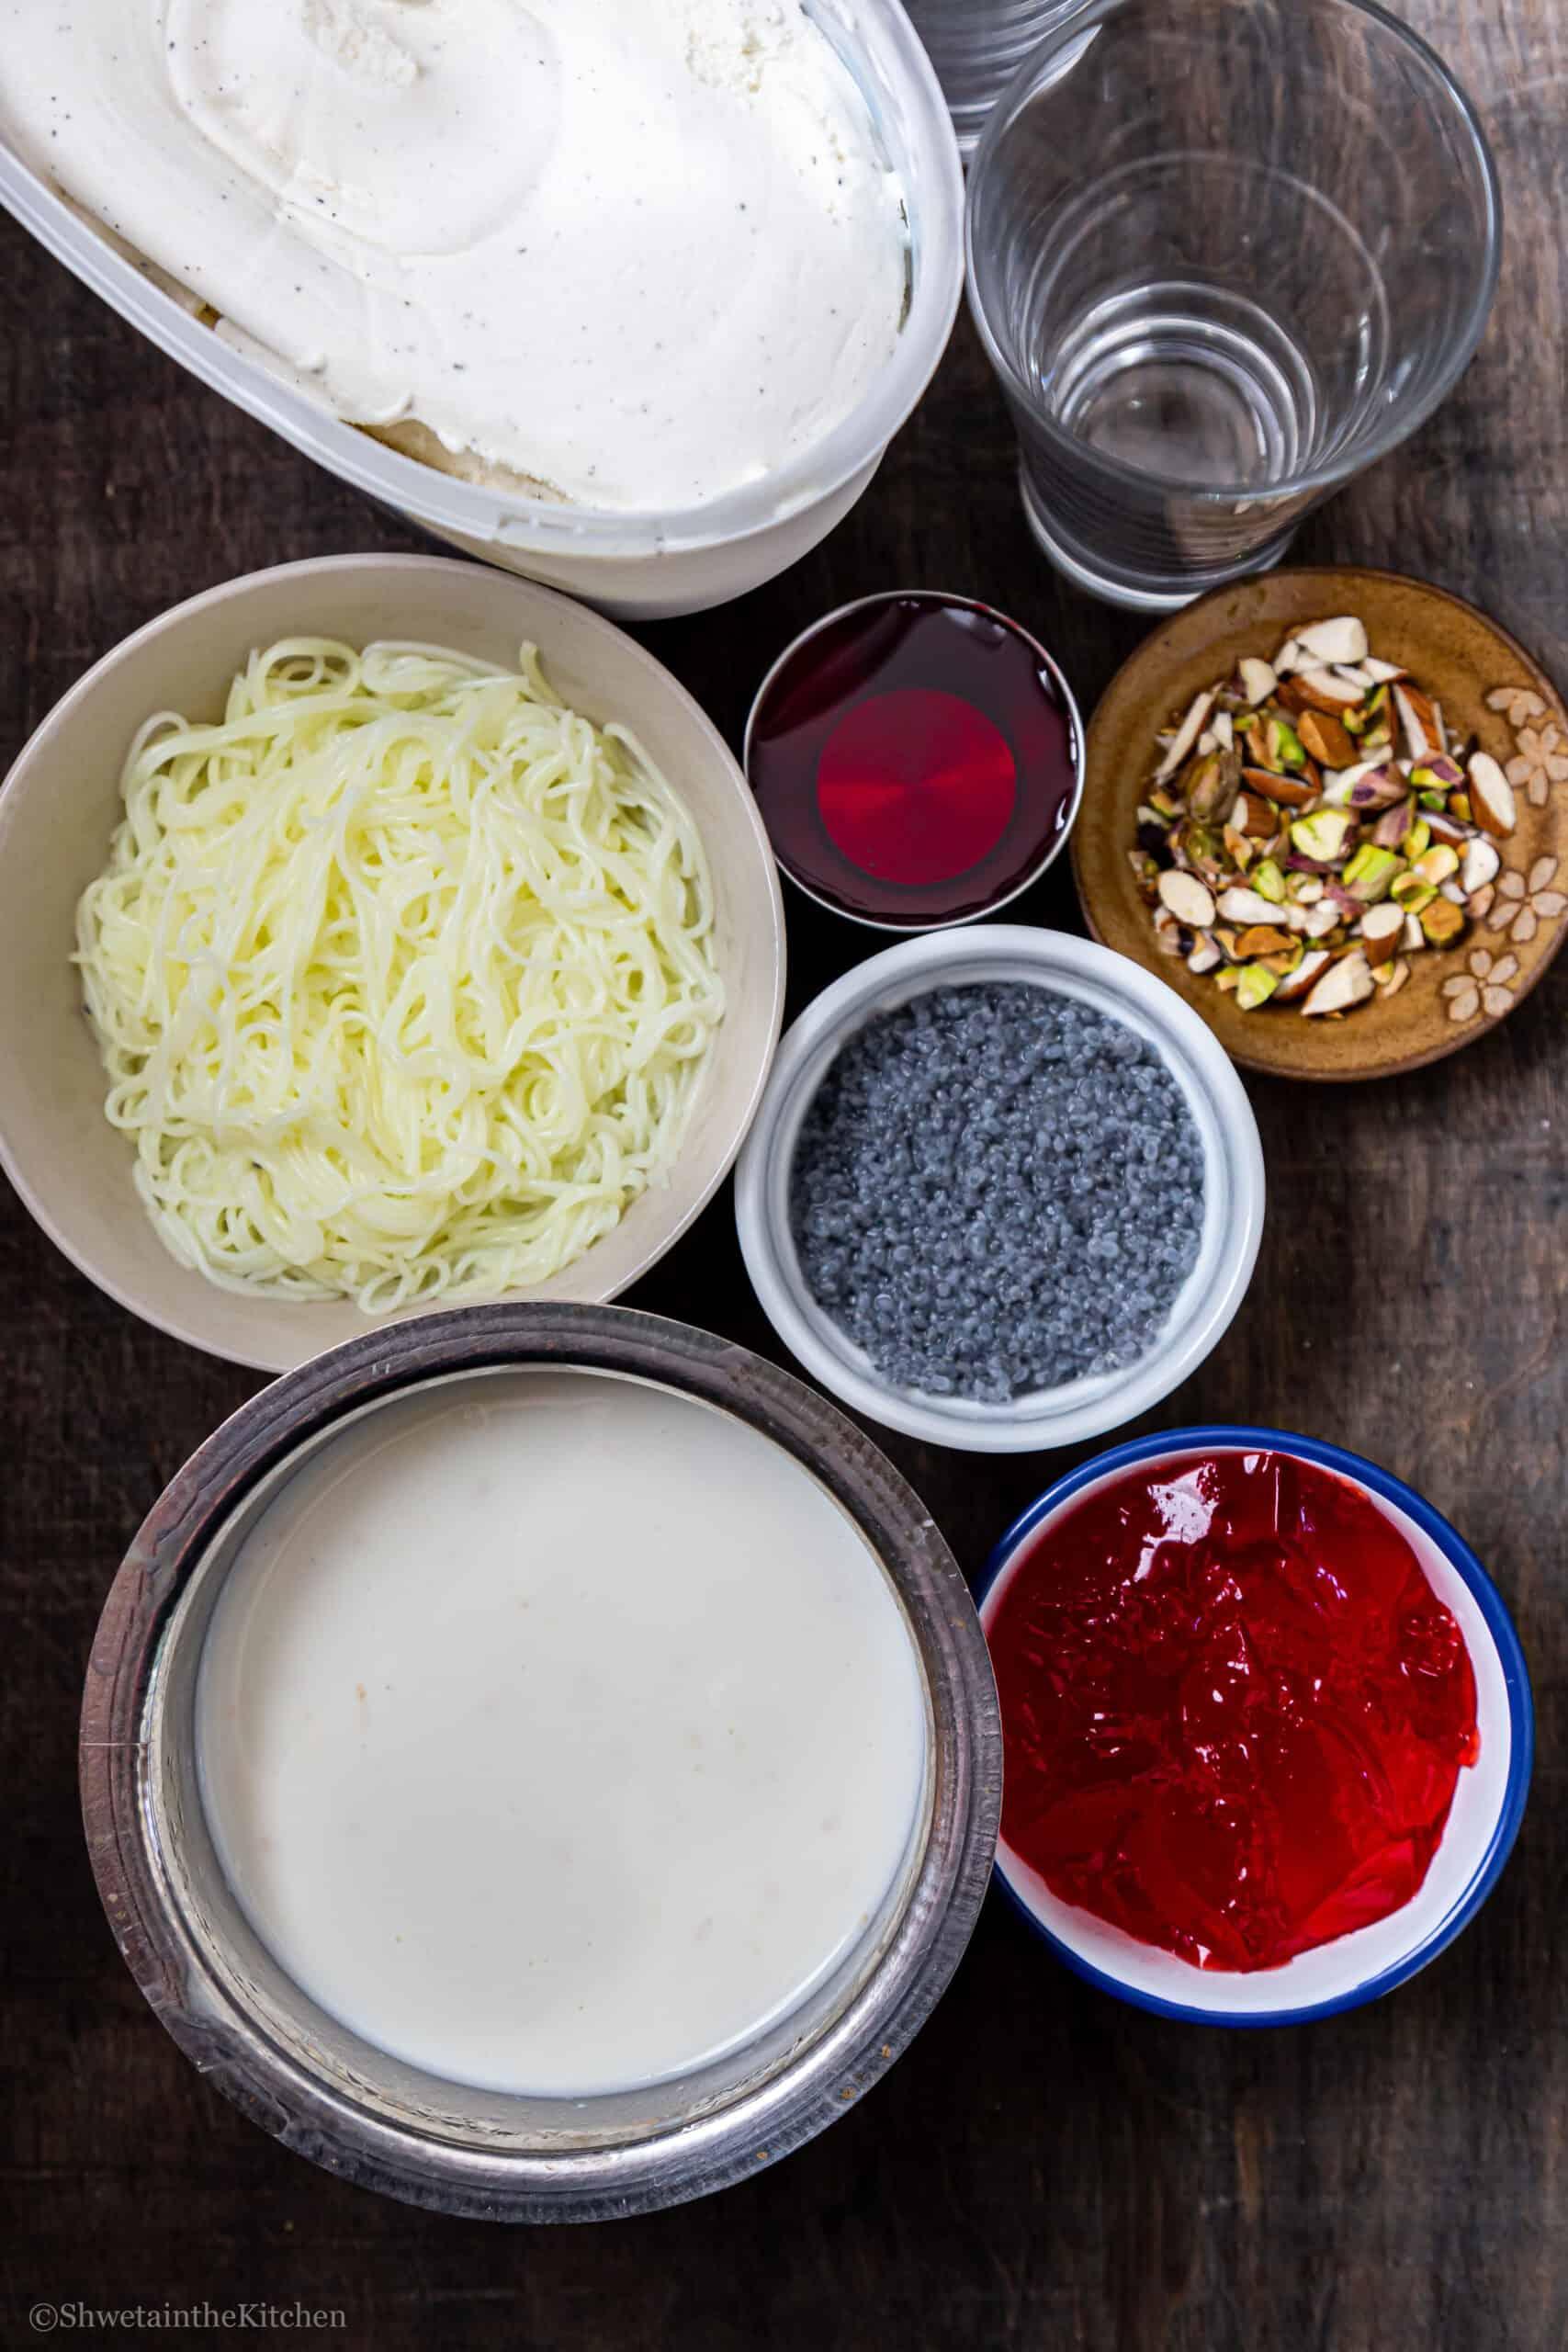 Falooda Ingredients